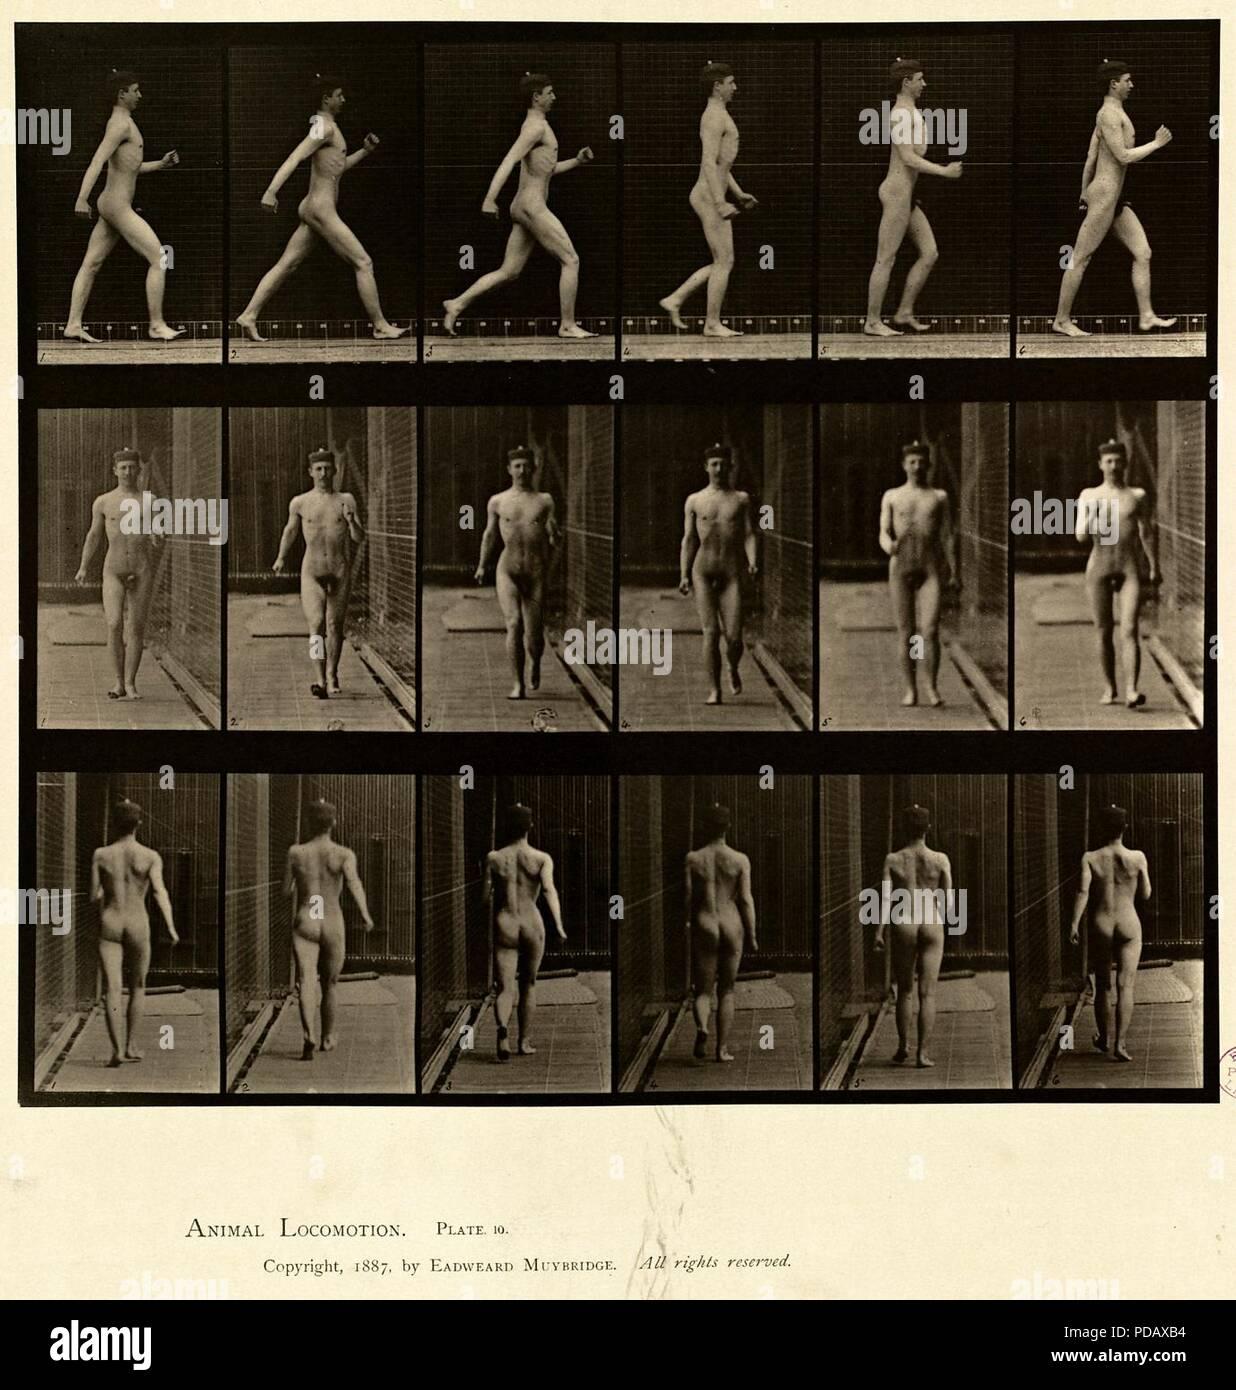 Animal locomotion. Plate 10 Stock Photo